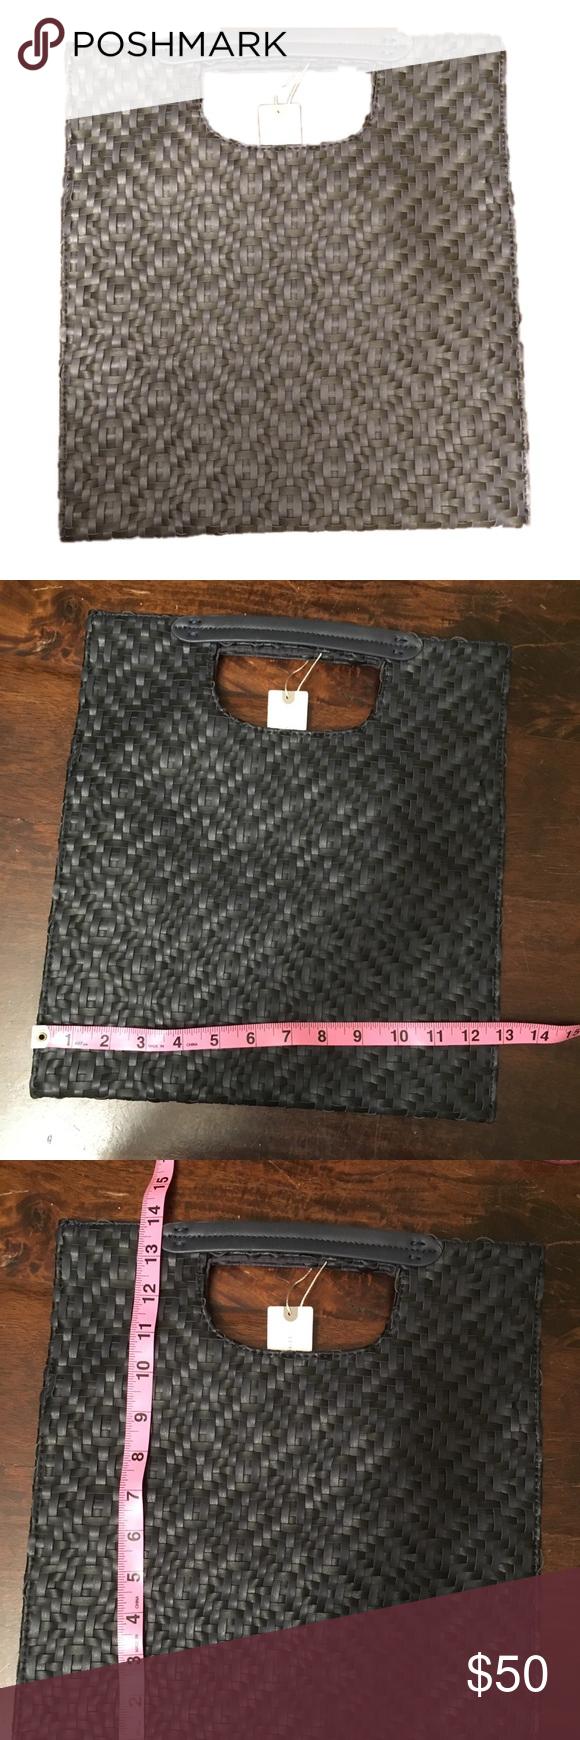 21dcb42ba7 Anthropologie Cara Woven Fold Over Clutch Noir and black basket weave  purse. Interior zipper pocket and two noir satin slip pockets.